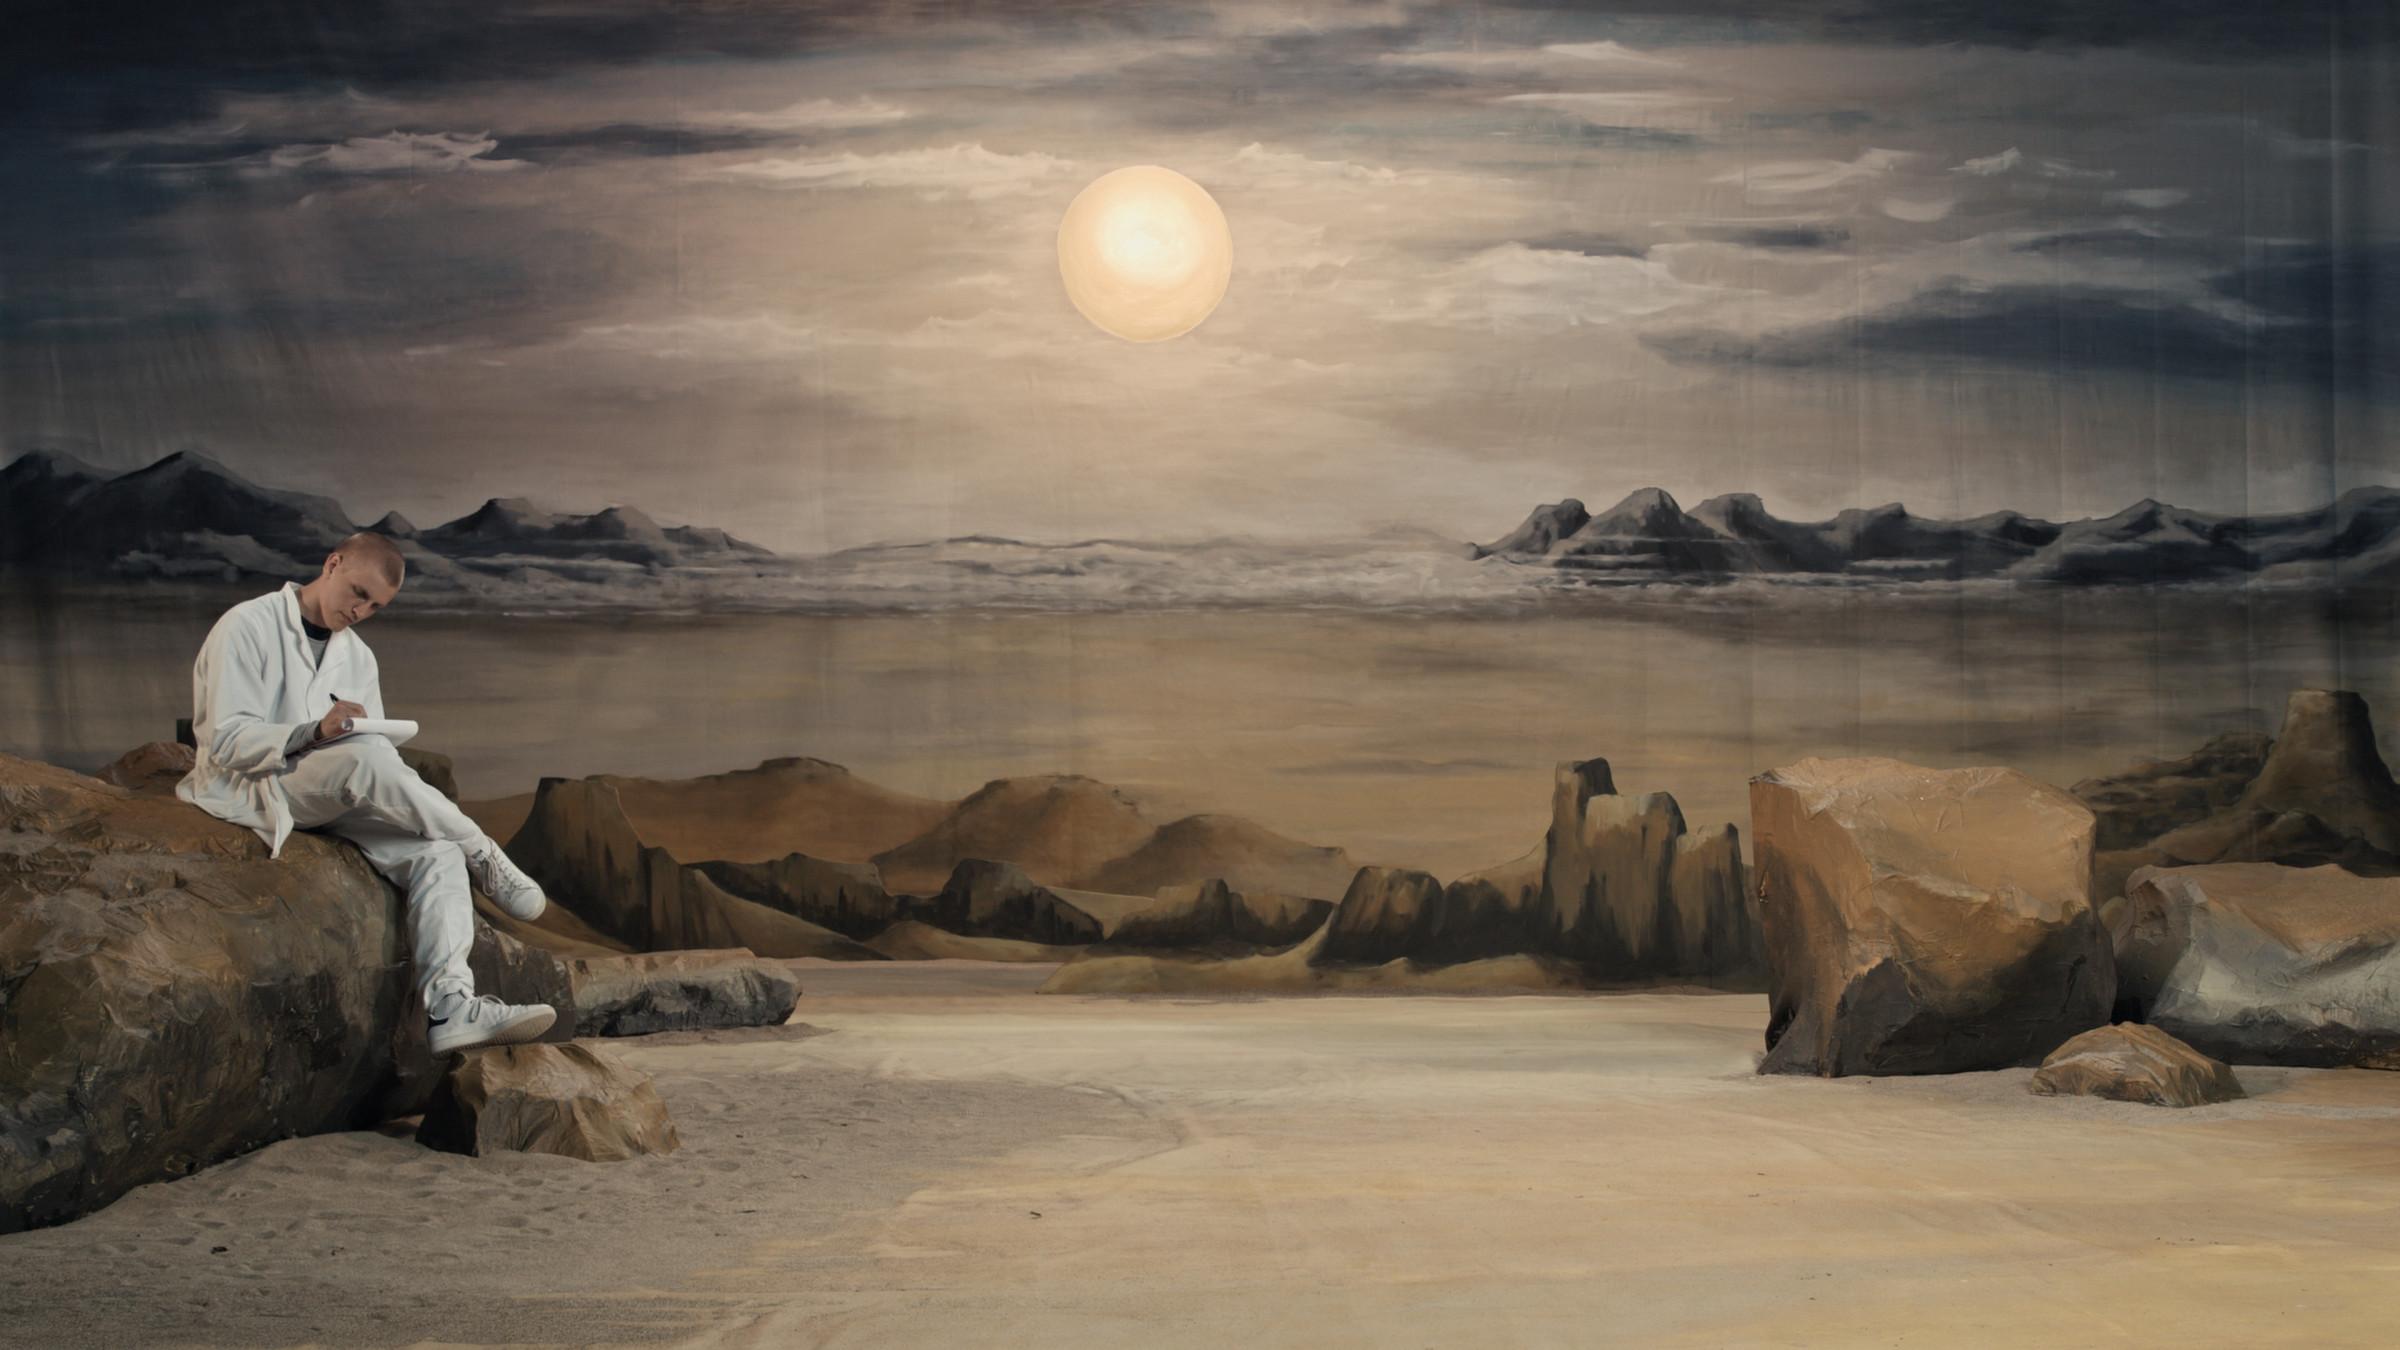 <span class=&#34;link fancybox-details-link&#34;><a href=&#34;/exhibitions/168/works/artworks15767/&#34;>View Detail Page</a></span><div class=&#34;artist&#34;><strong>RAGNAR KJARTANSSON</strong></div><div class=&#34;title&#34;><em>Figures in Landscape (Tuesday)</em>, 2018</div><div class=&#34;medium&#34;>single channel video</div><div class=&#34;dimensions&#34;>video, 24 hours</div><div class=&#34;edition_details&#34;>Edition of 6 plus 2 artist's proofs</div>